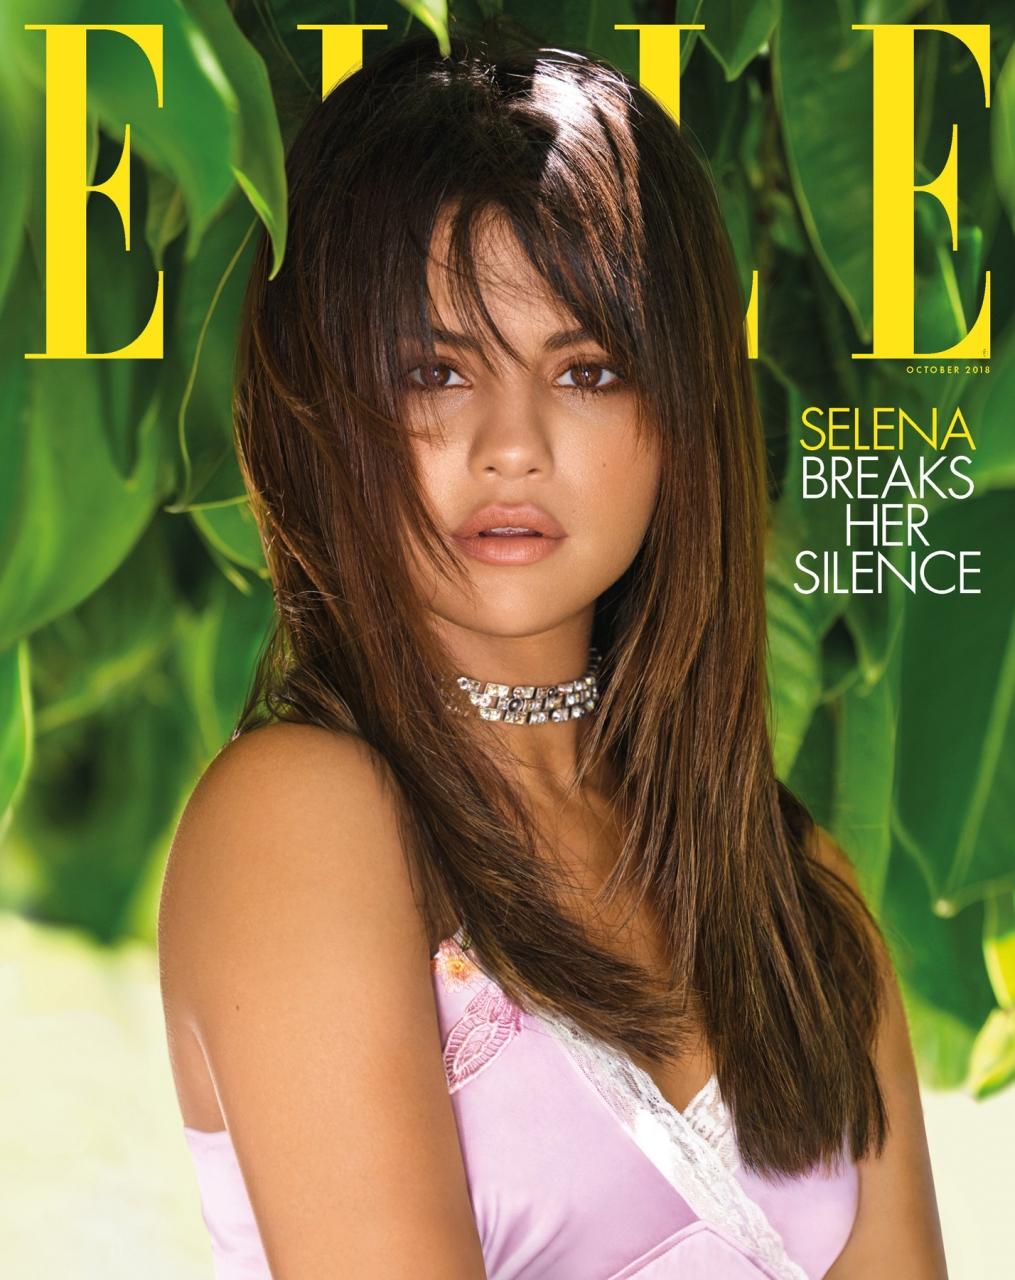 Selena Gomez by Mariano Vivanco for Elle US